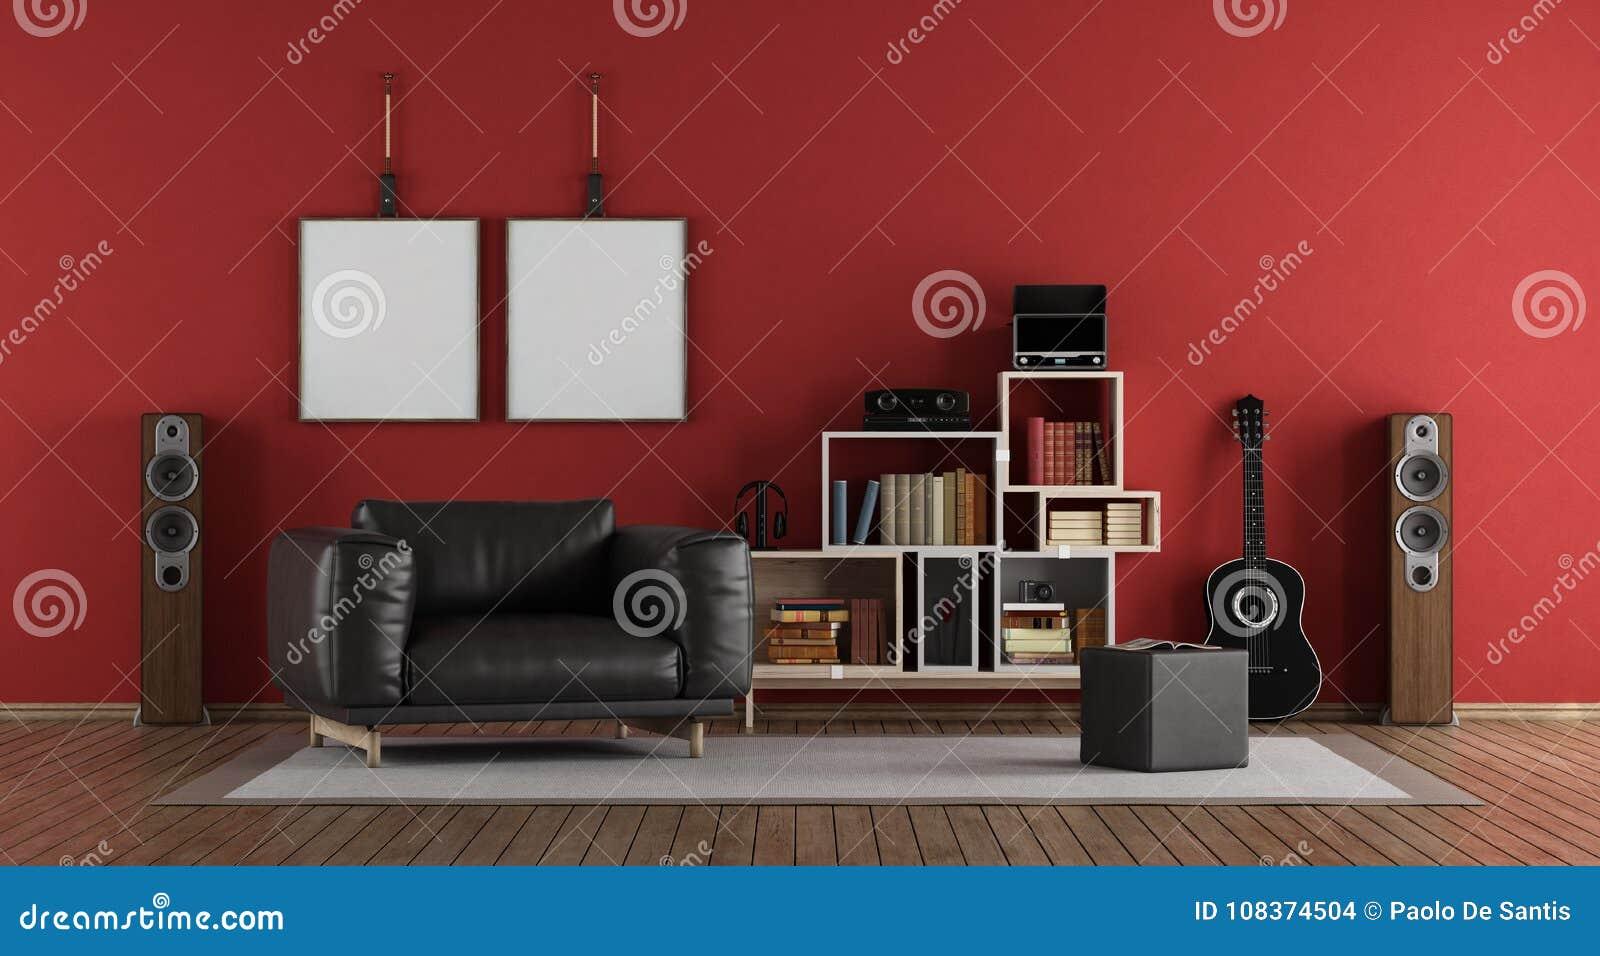 red music room stock illustration illustration of interior 108374504 rh dreamstime com